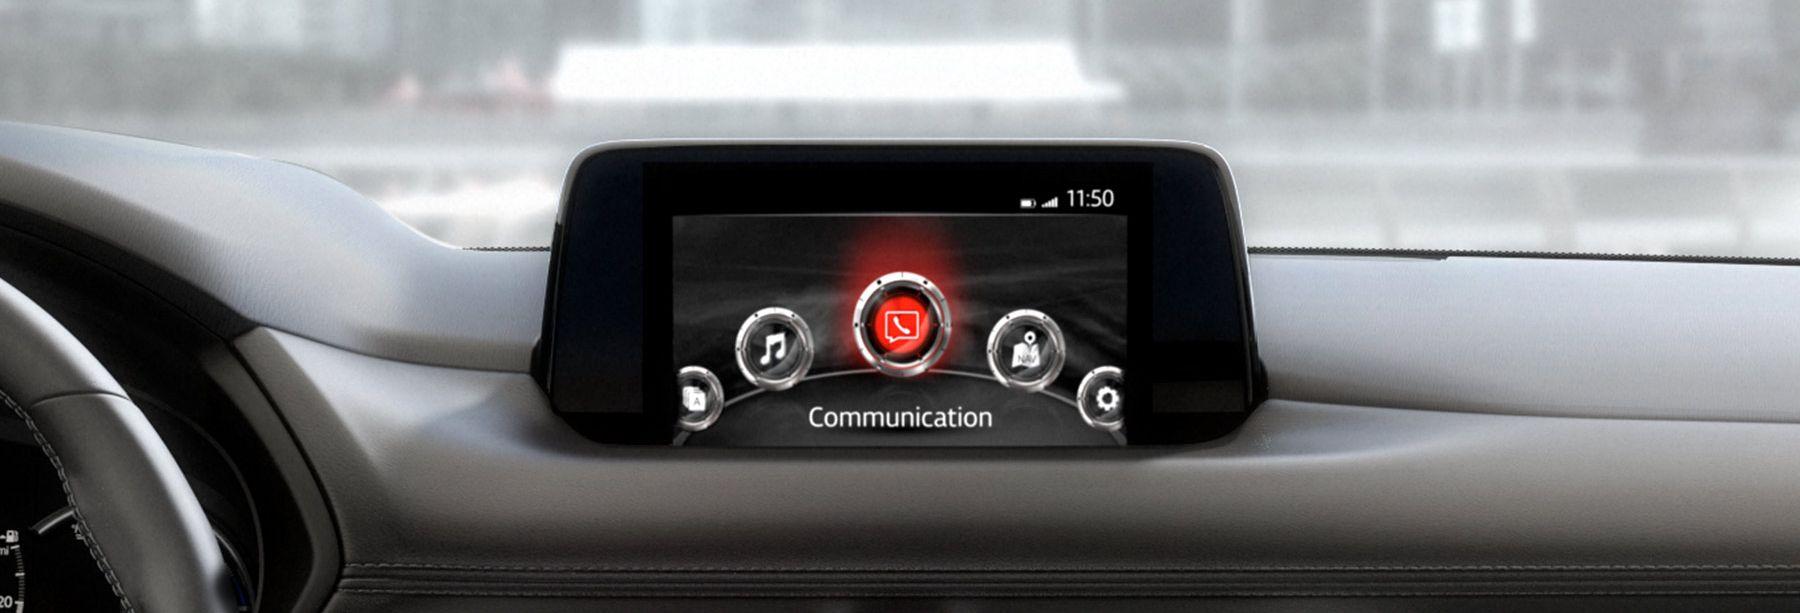 2019 Mazda CX-5 Touchscreen